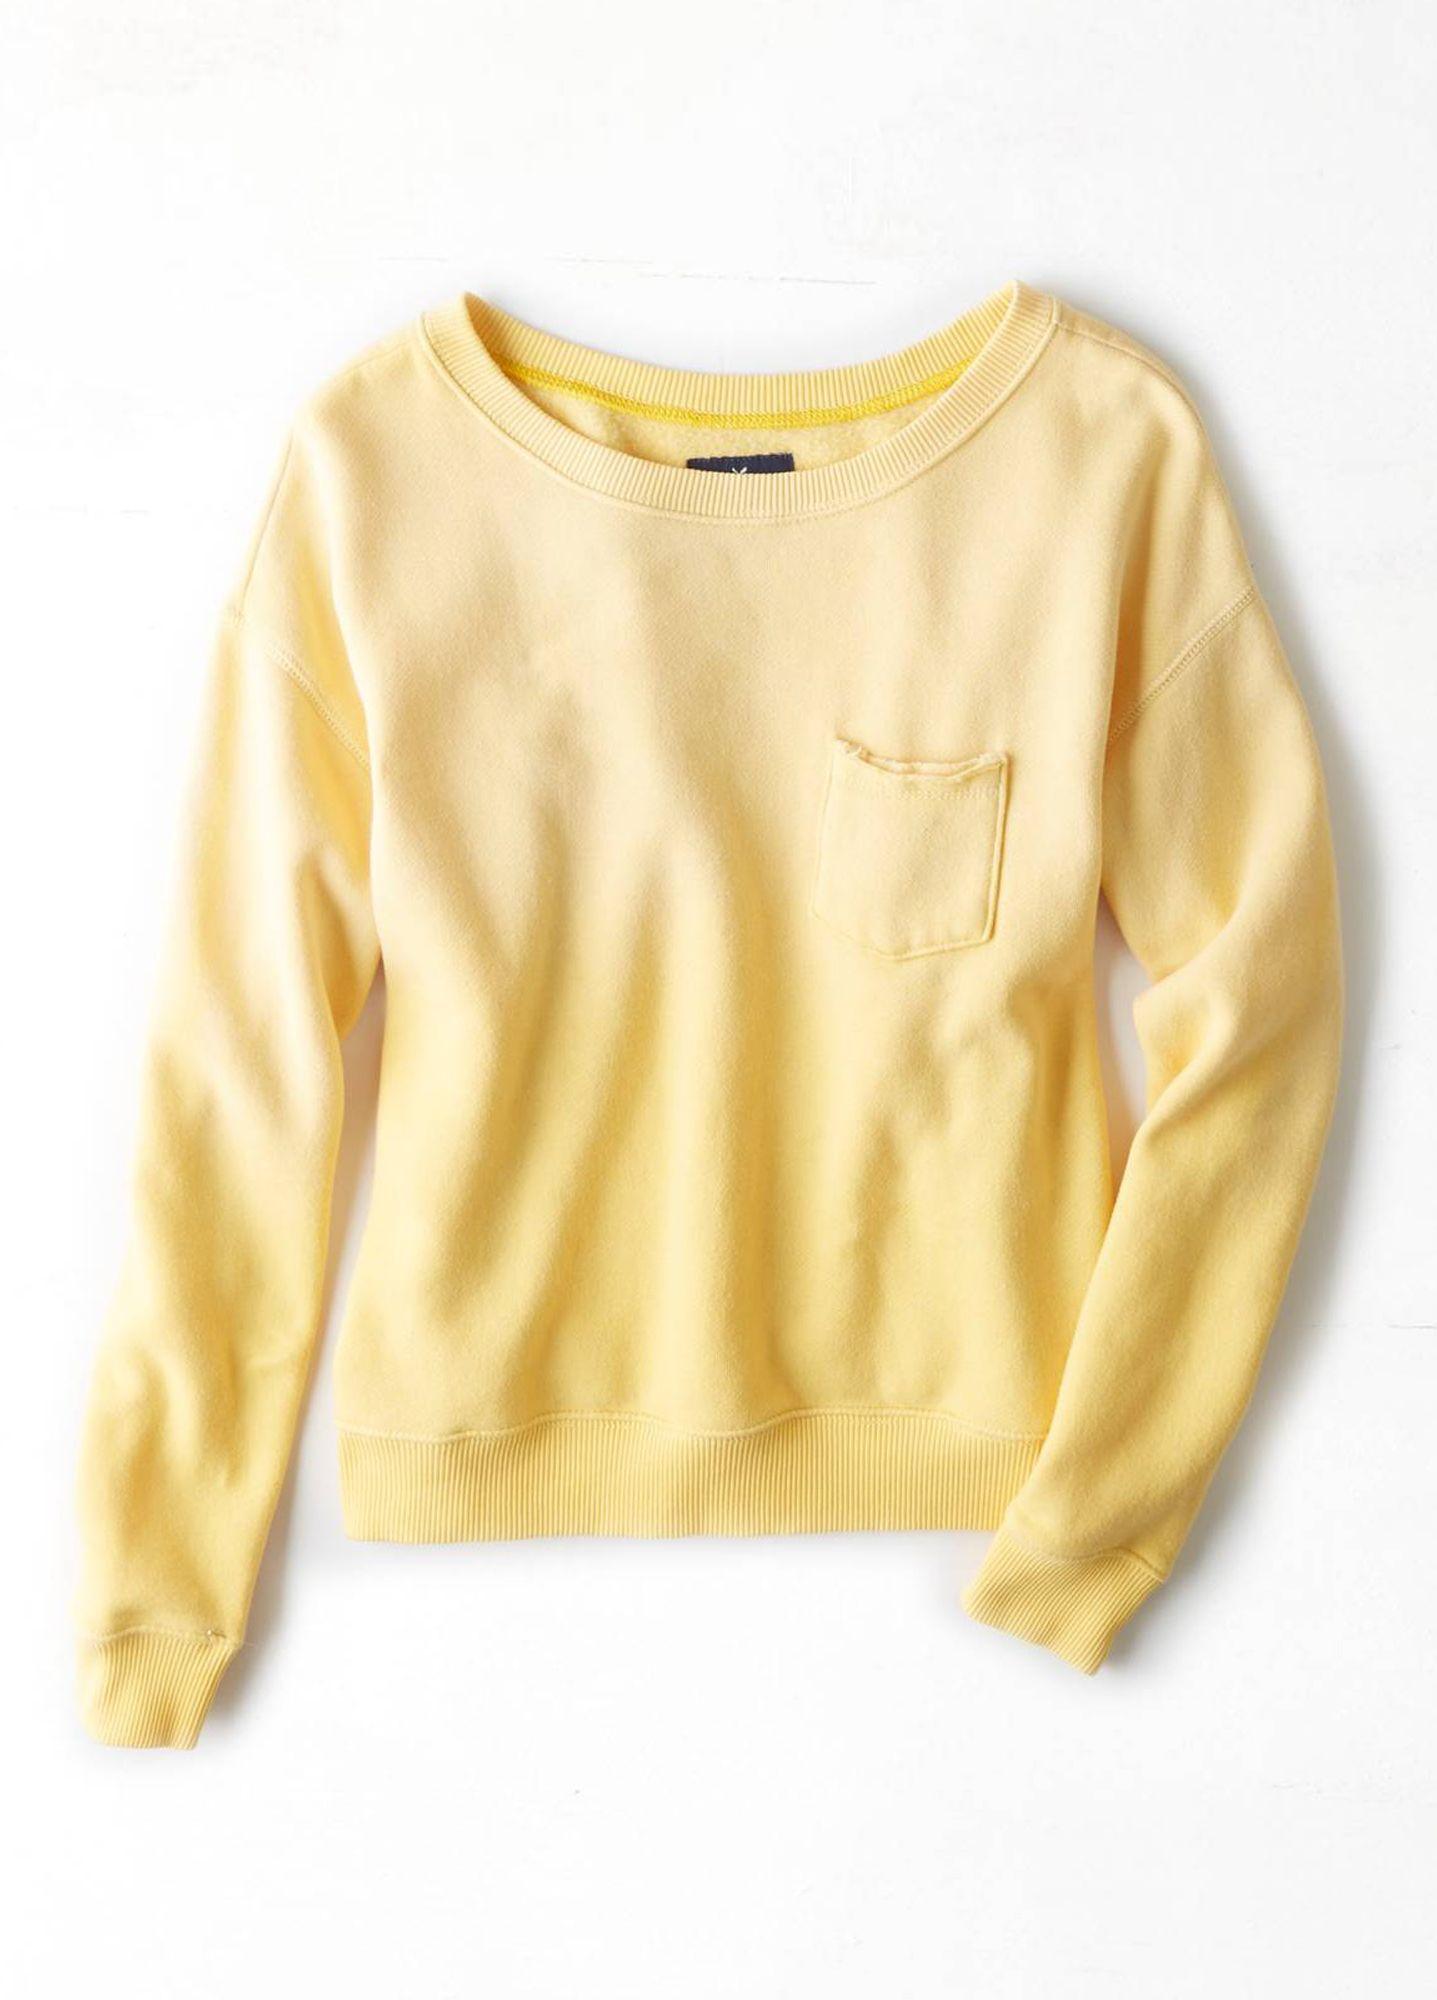 [Women] intl wash crew with pocket sweater   상품상세   SK FASHION MALL